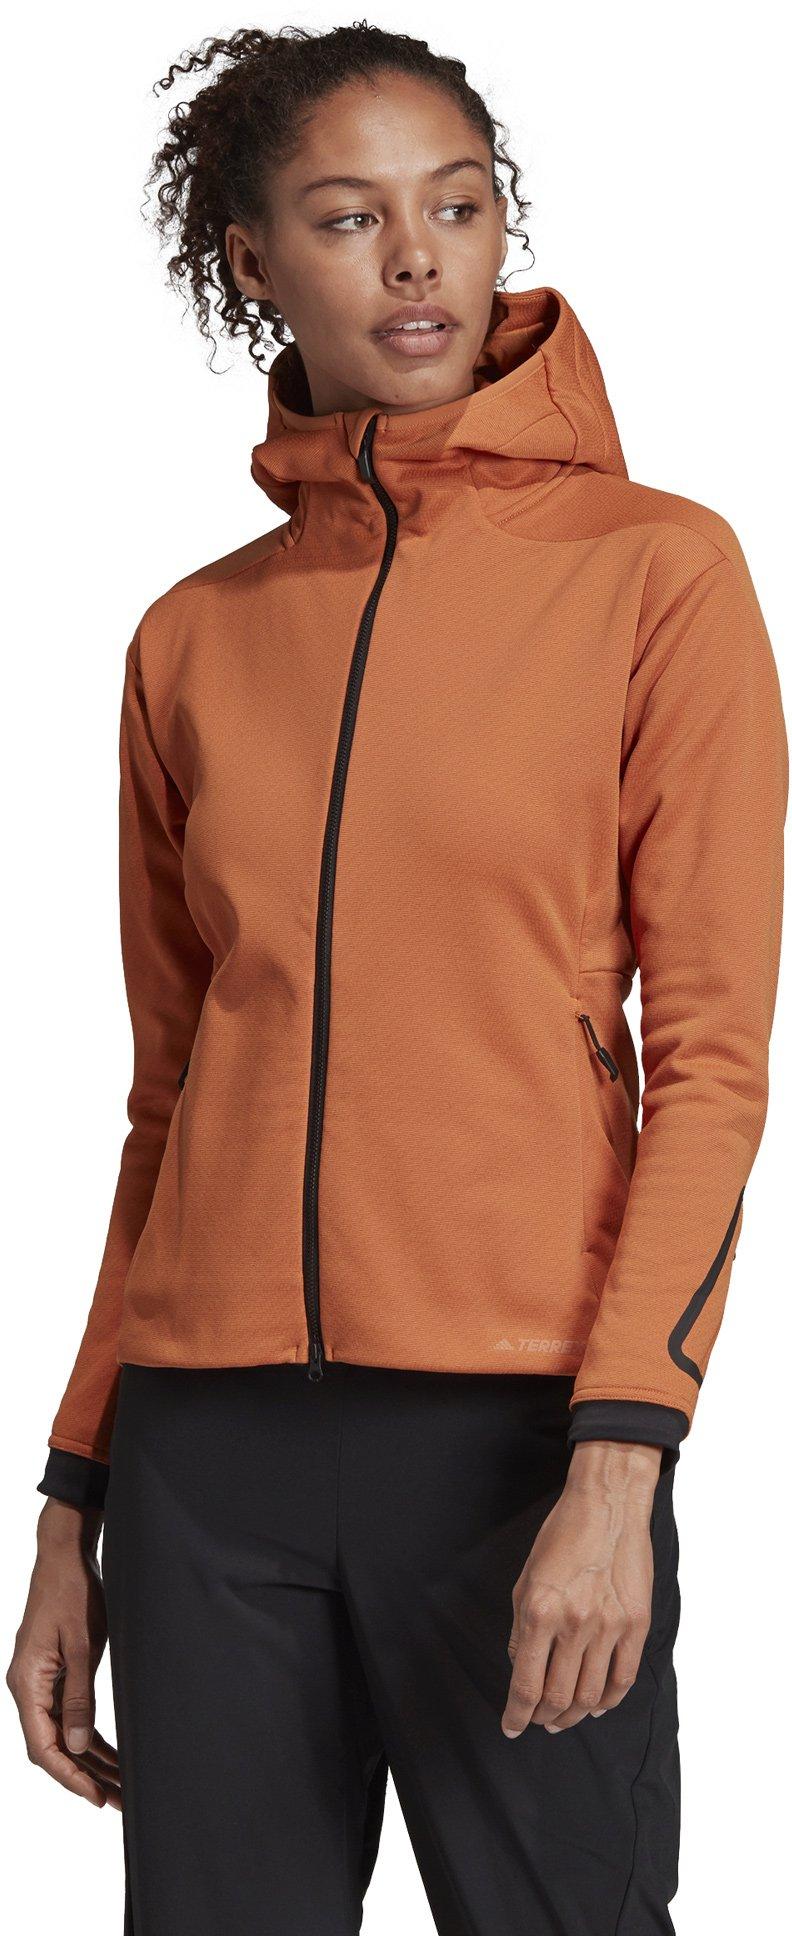 adidas Climaheat Hooded Fleece Jacket W S